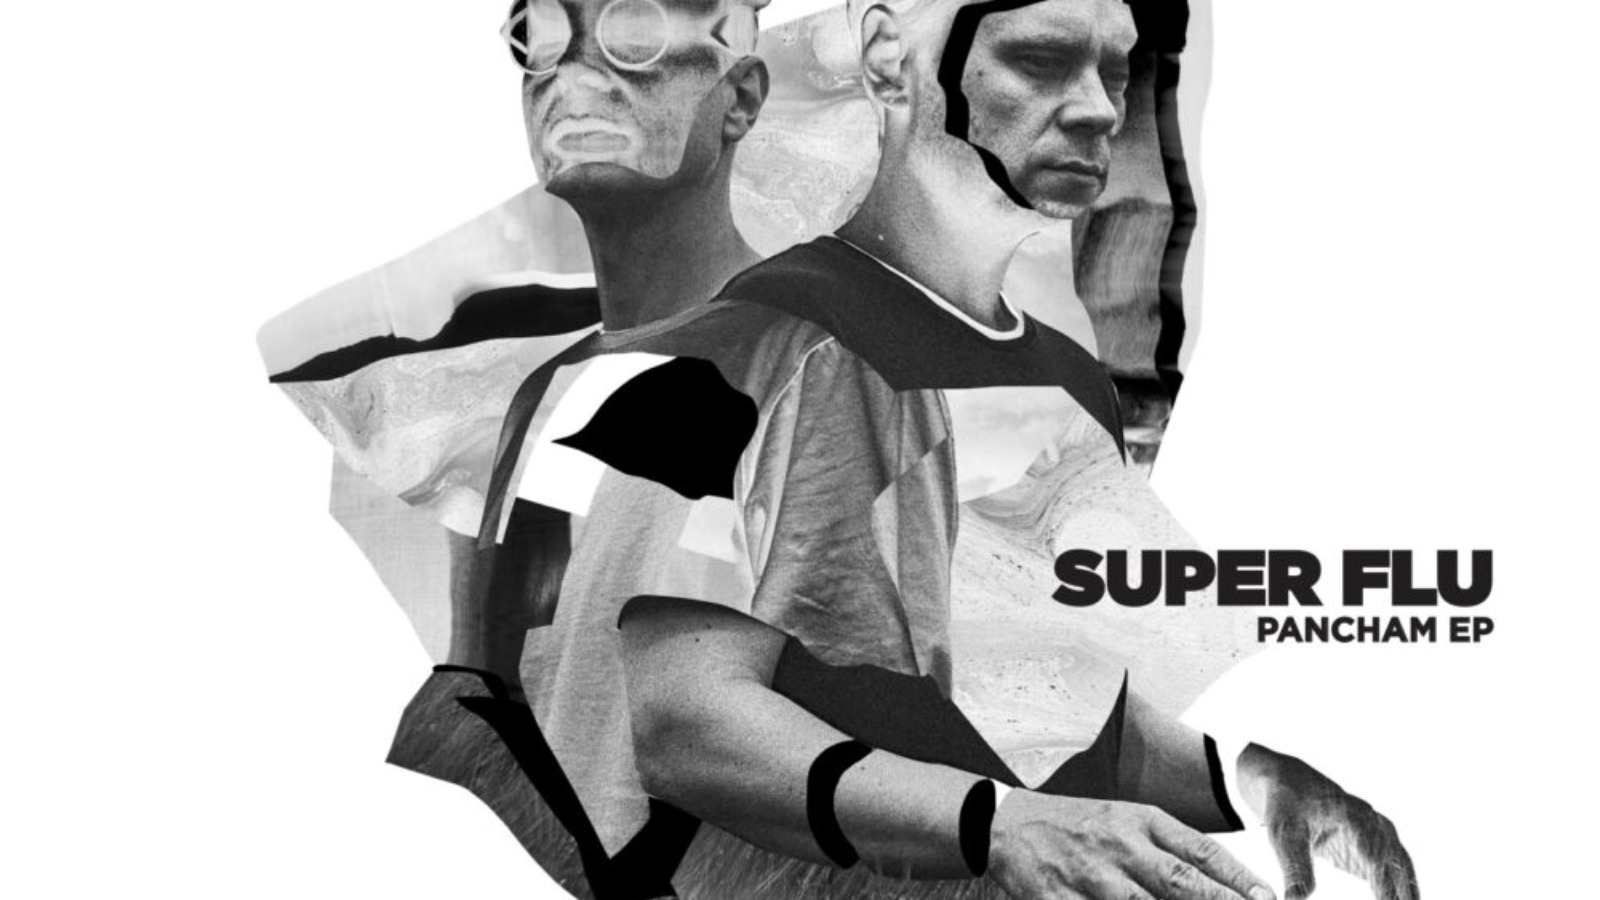 PACKSHOT Super Flu - Pancham EP - Thick As Thieves